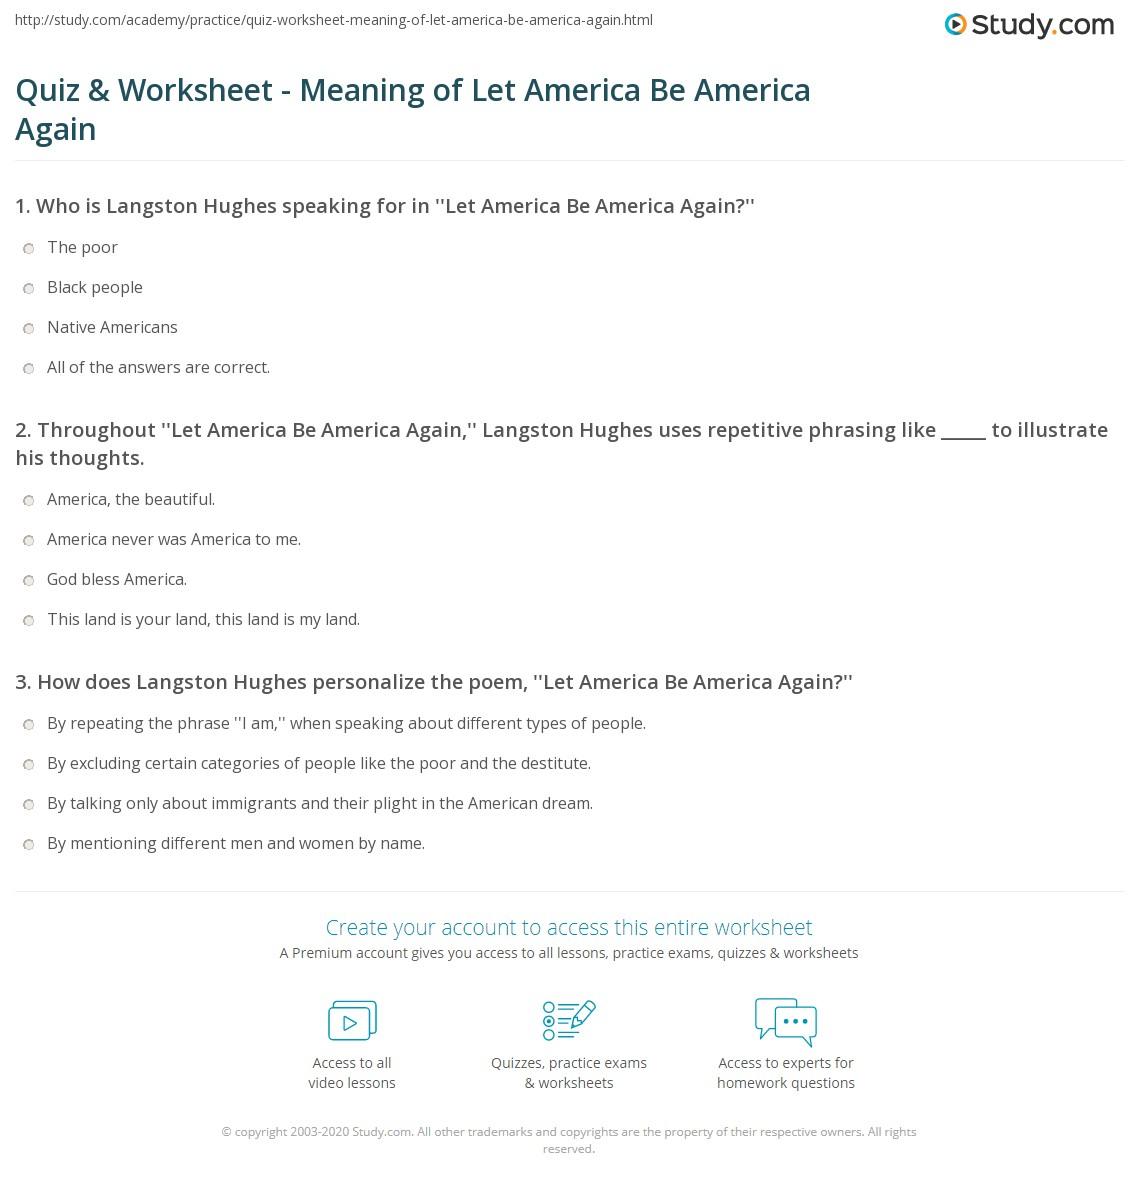 let america be america again analysis